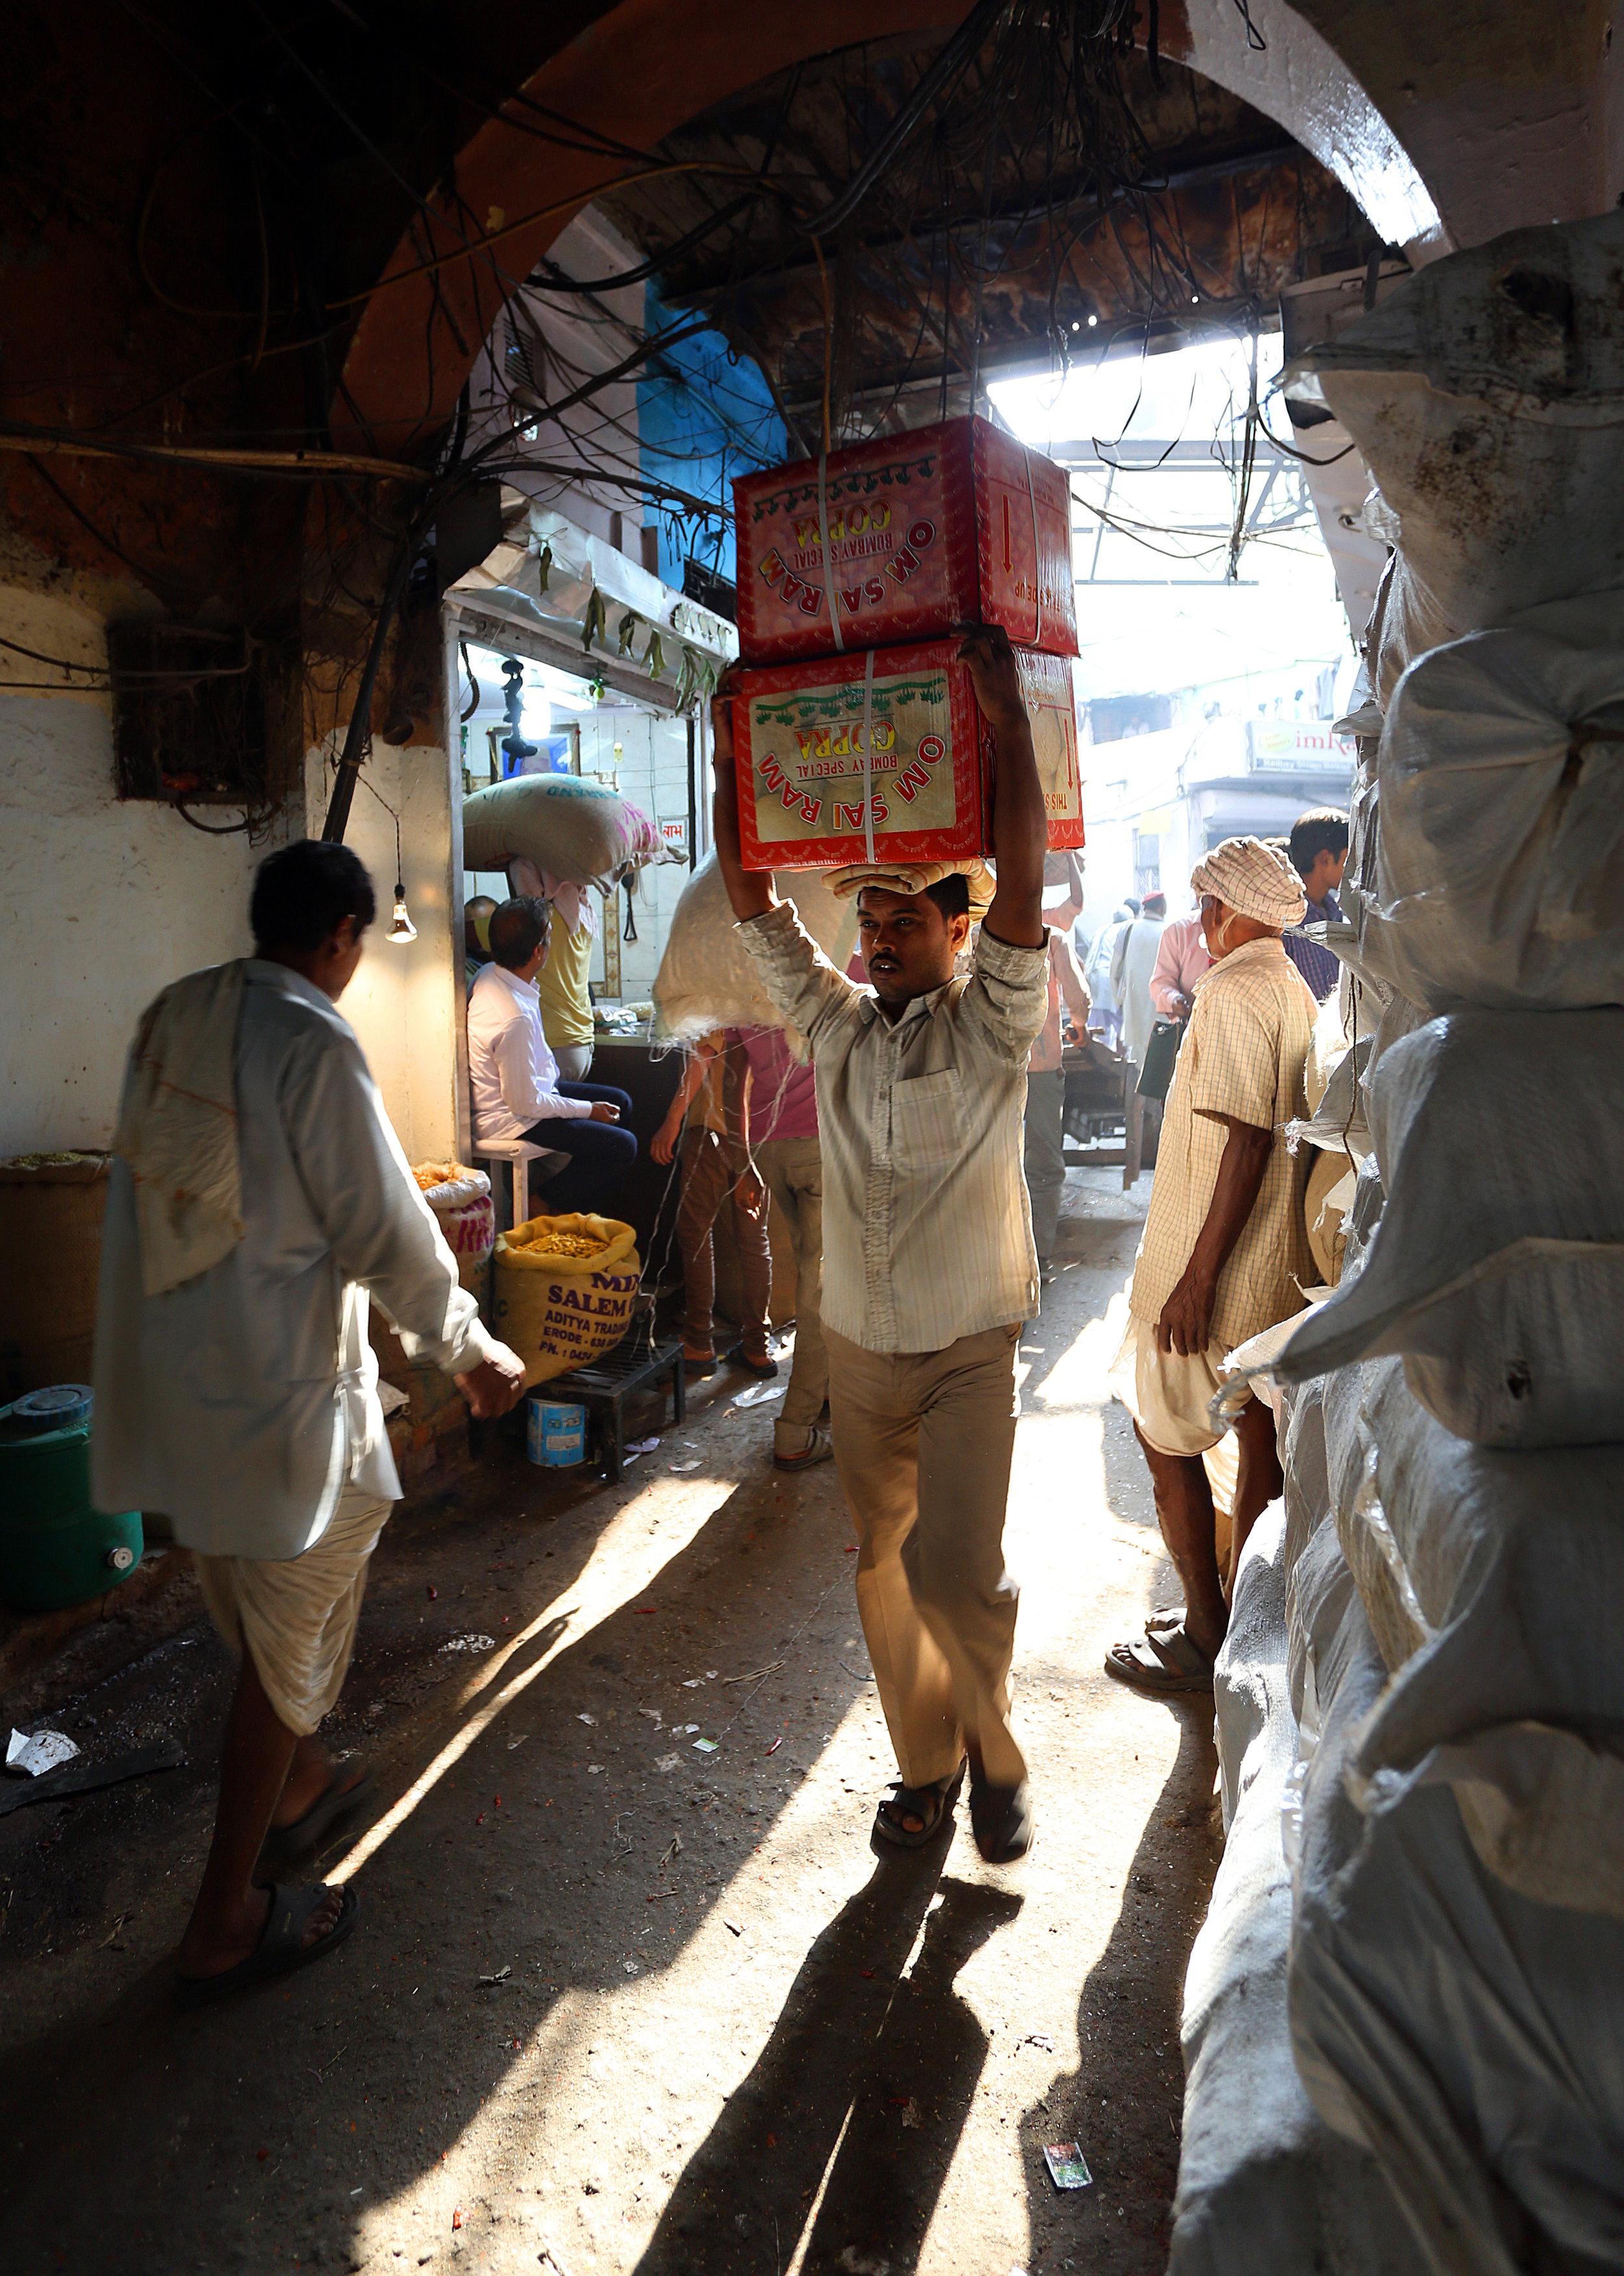 India Street Life21.jpg